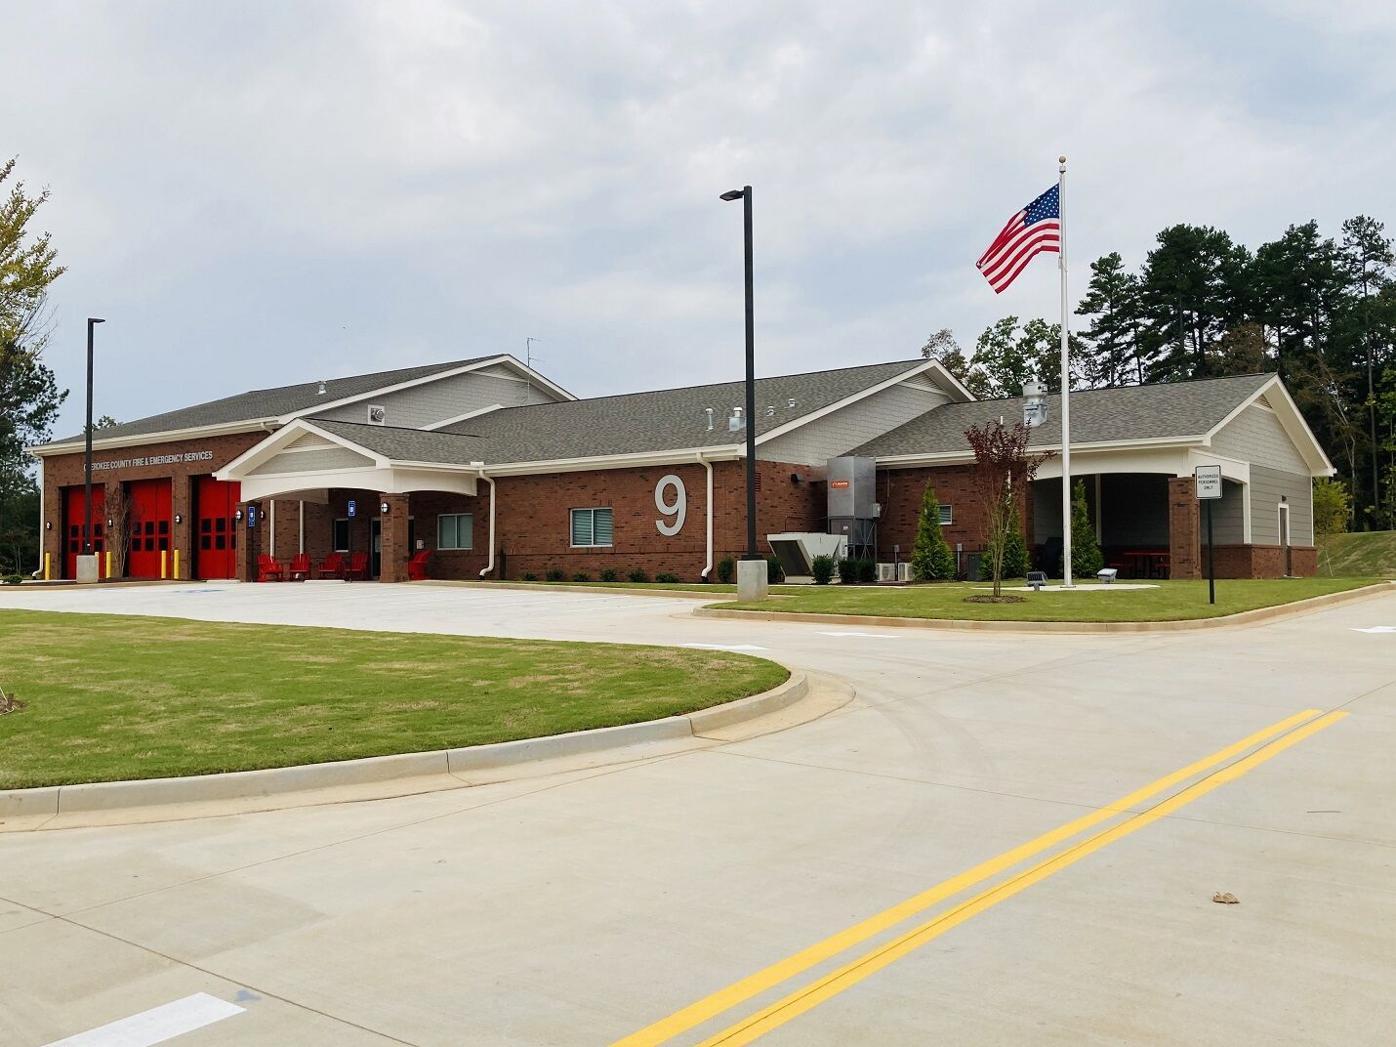 Fire station No. 9